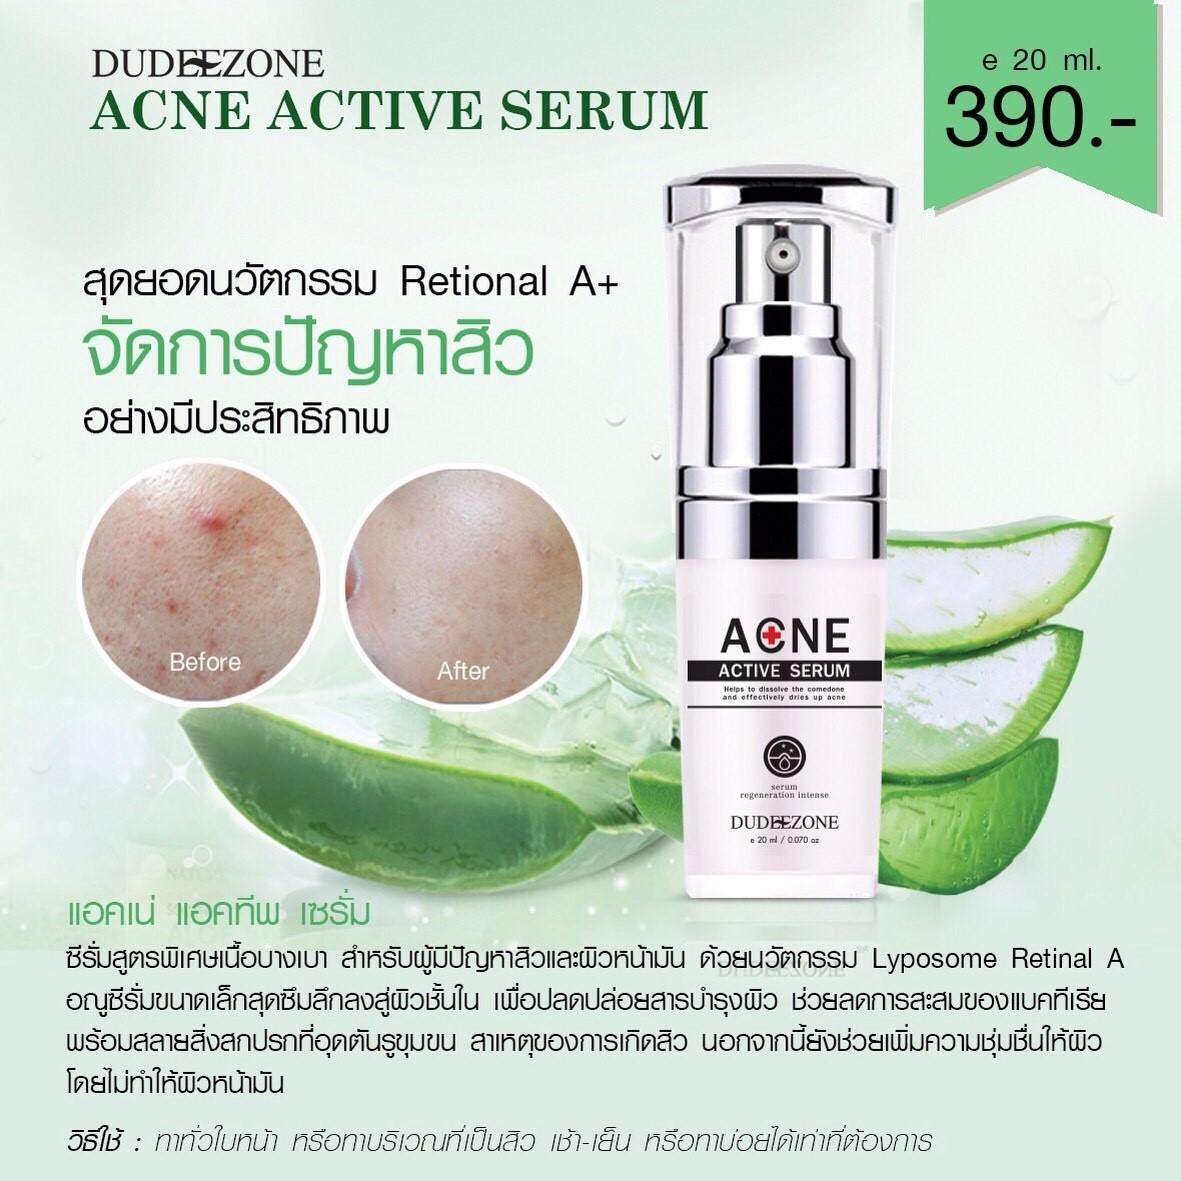 Acne Active Serum แอคเน่ แอคทีพ เซรั่ม